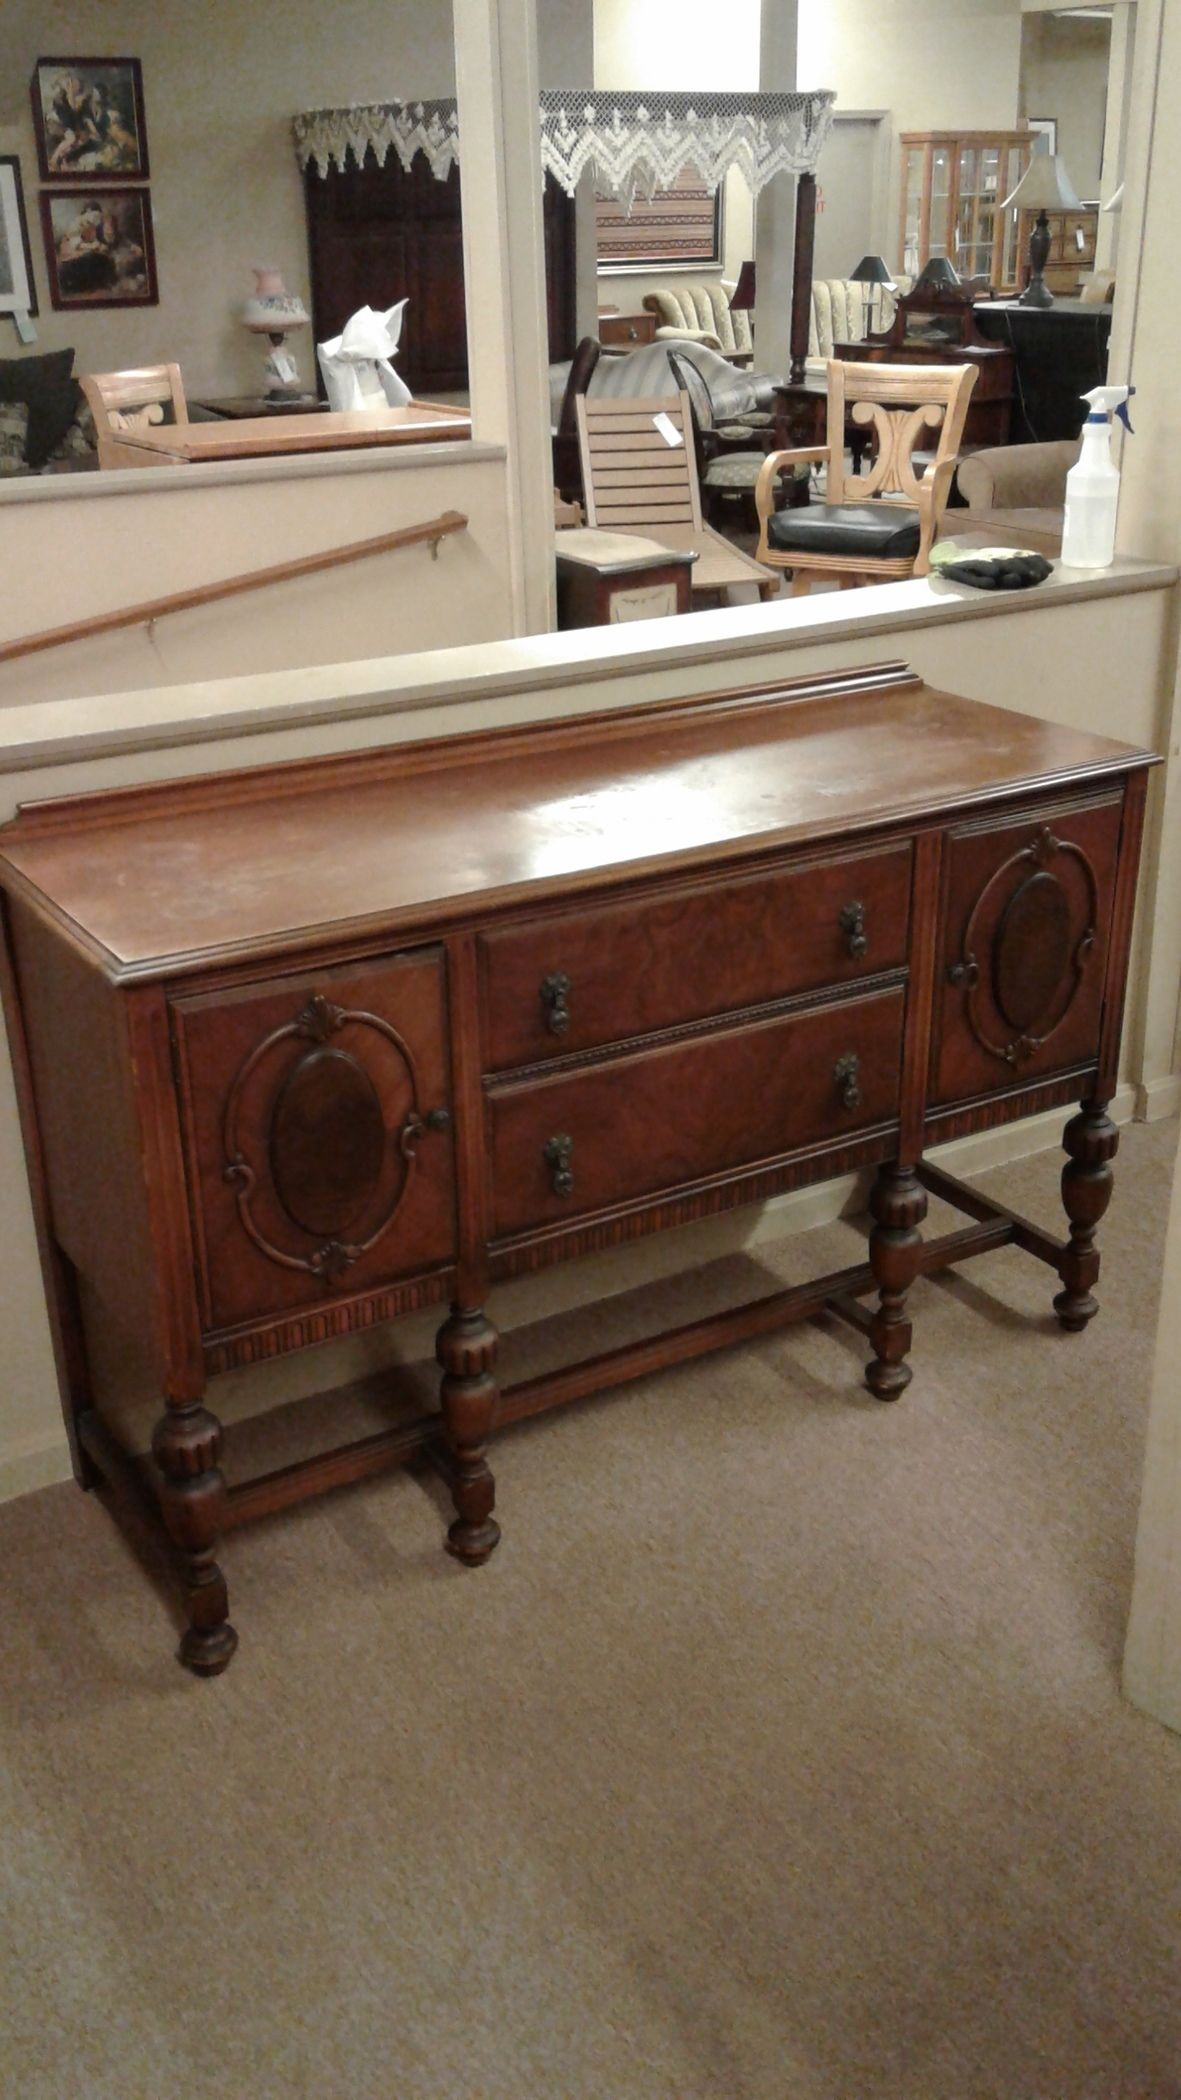 1920S ANTIQUE BUFFET Delmarva Furniture Consignment